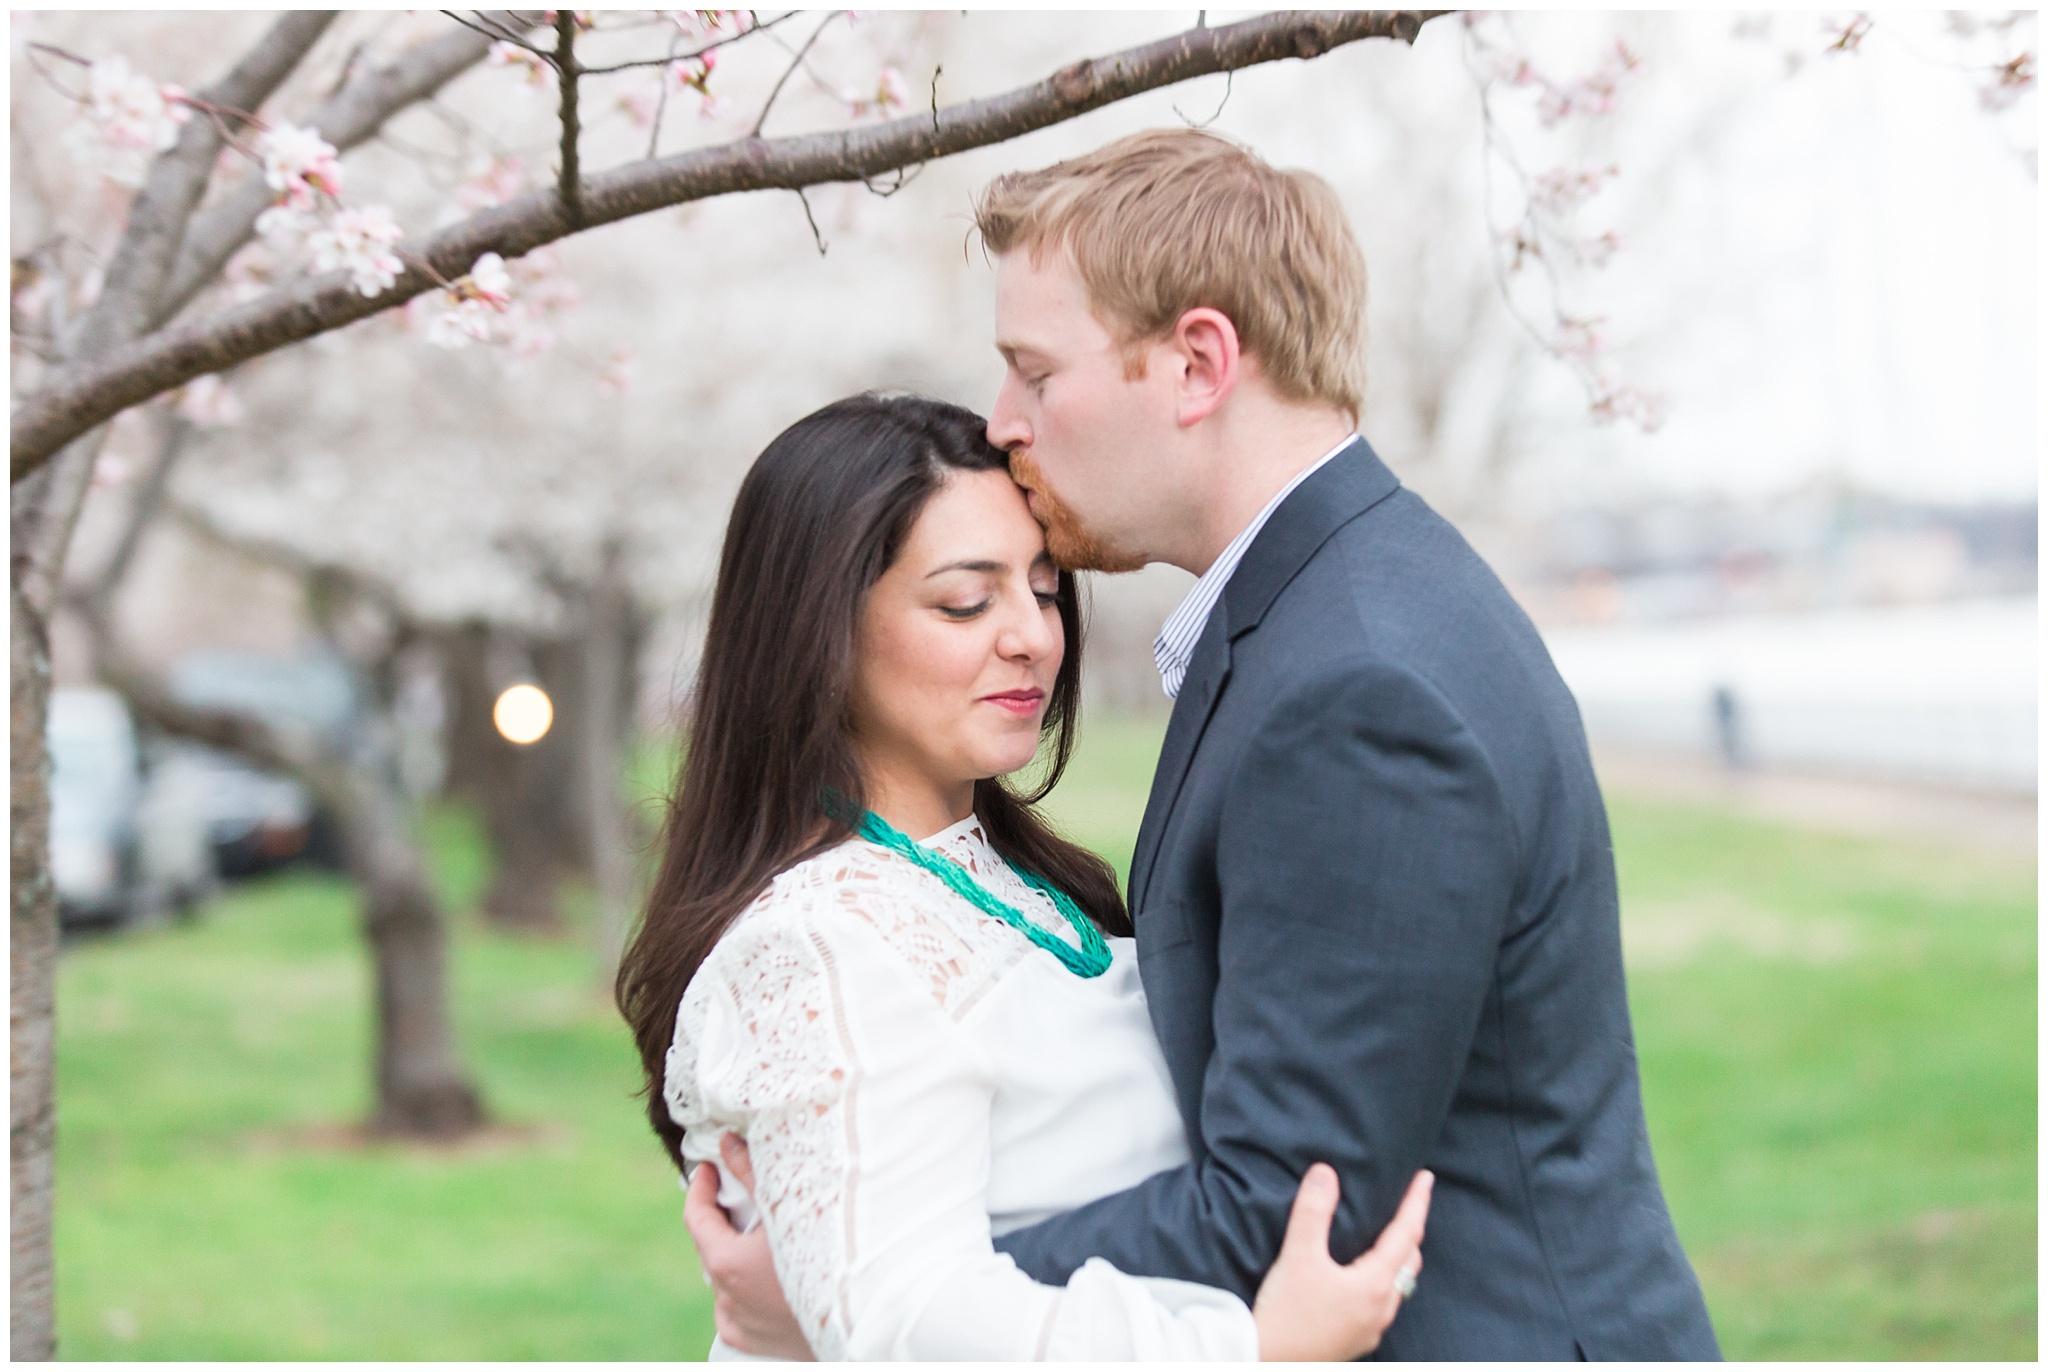 Cherry_Blossom_Engagement_0003.jpg